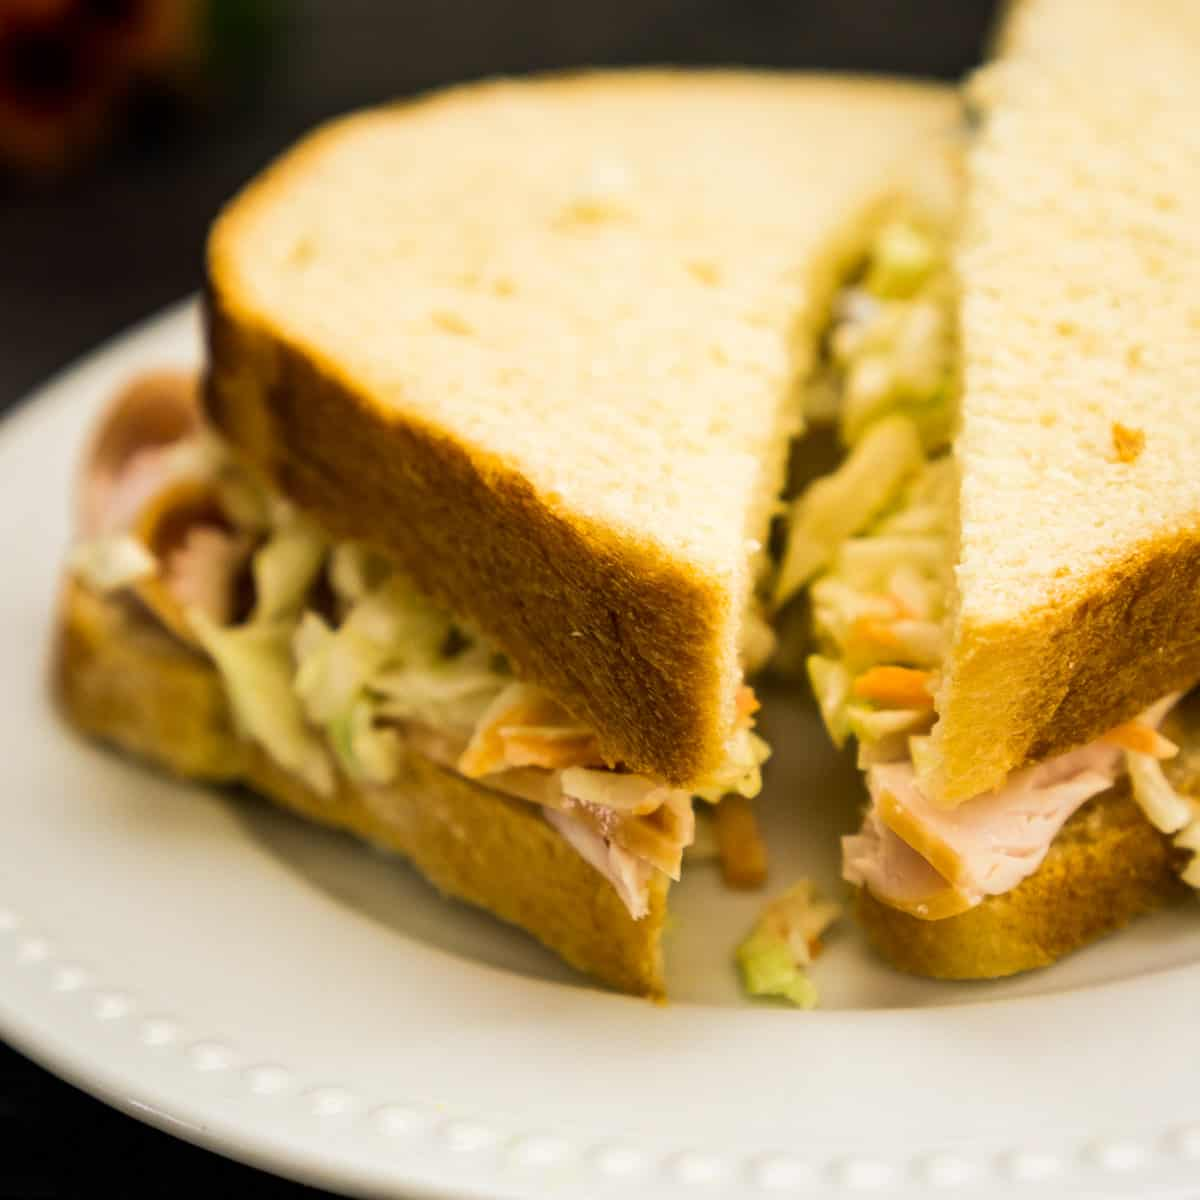 sandwich made with Hawaiian bread